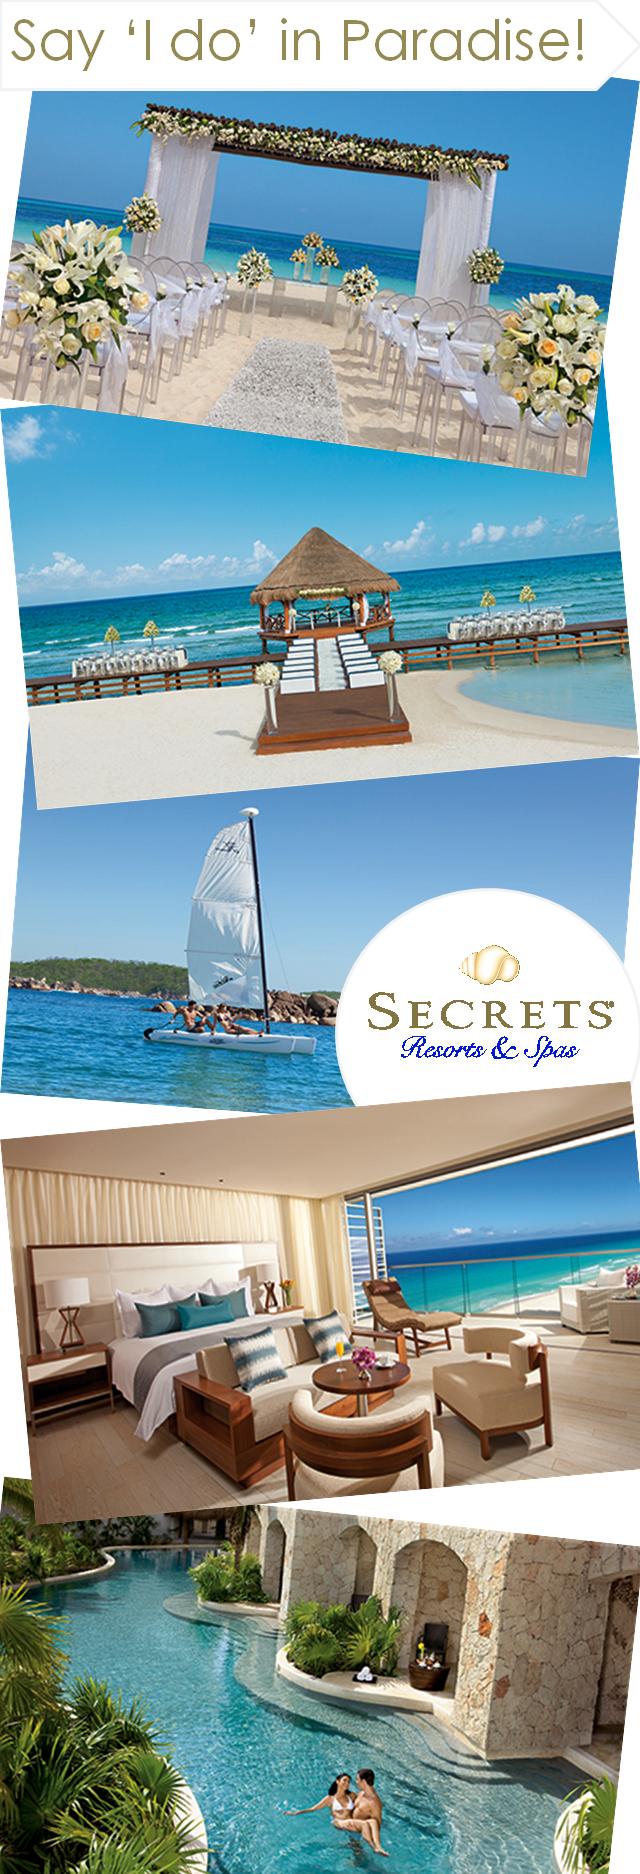 Sponsored Post Best wedding venues, Resort spa, Wedding